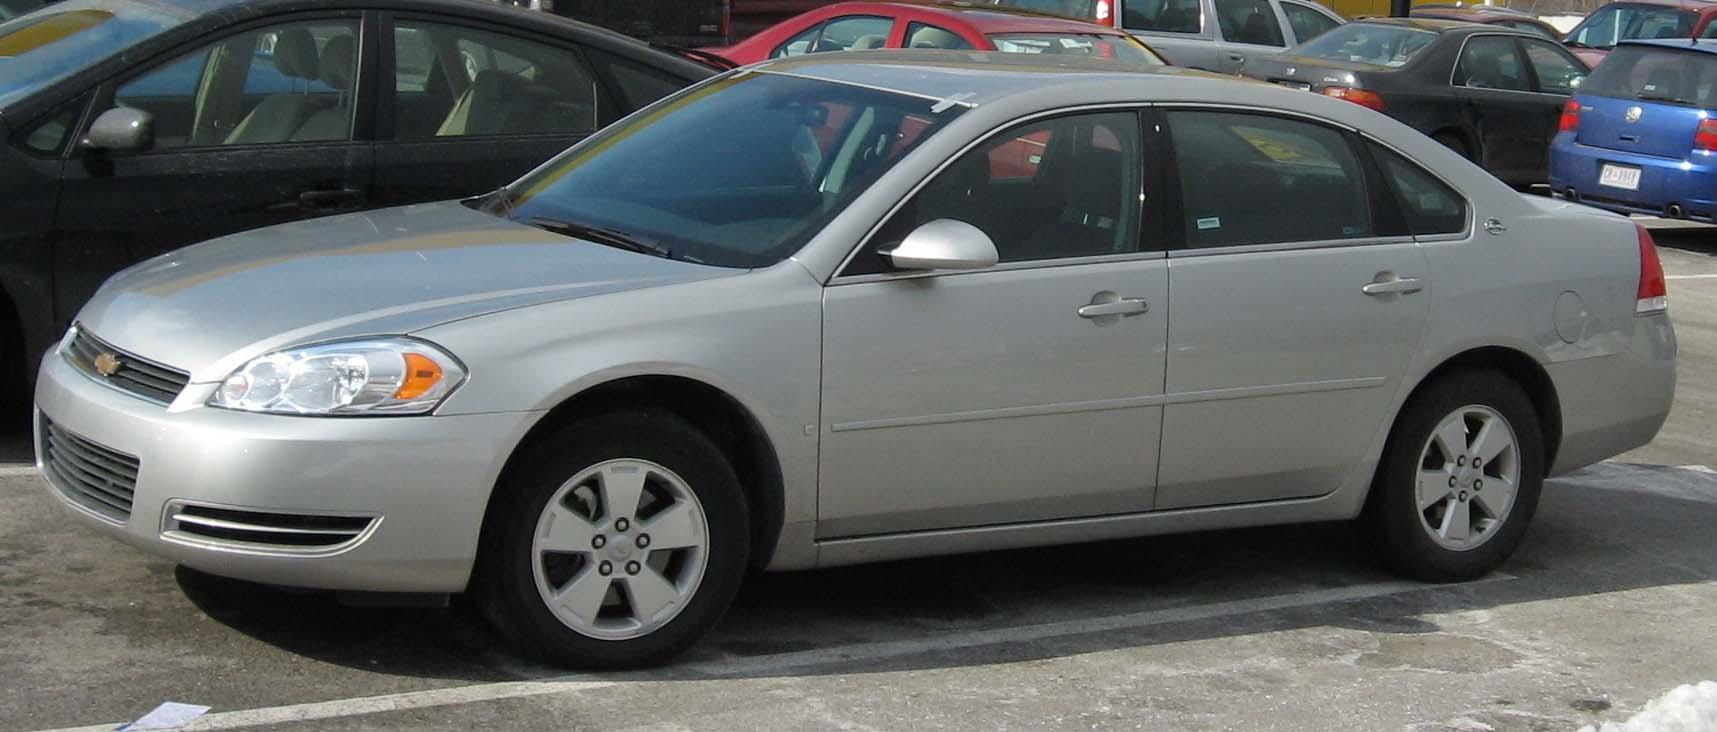 src download photo 2007 chevrolet impala